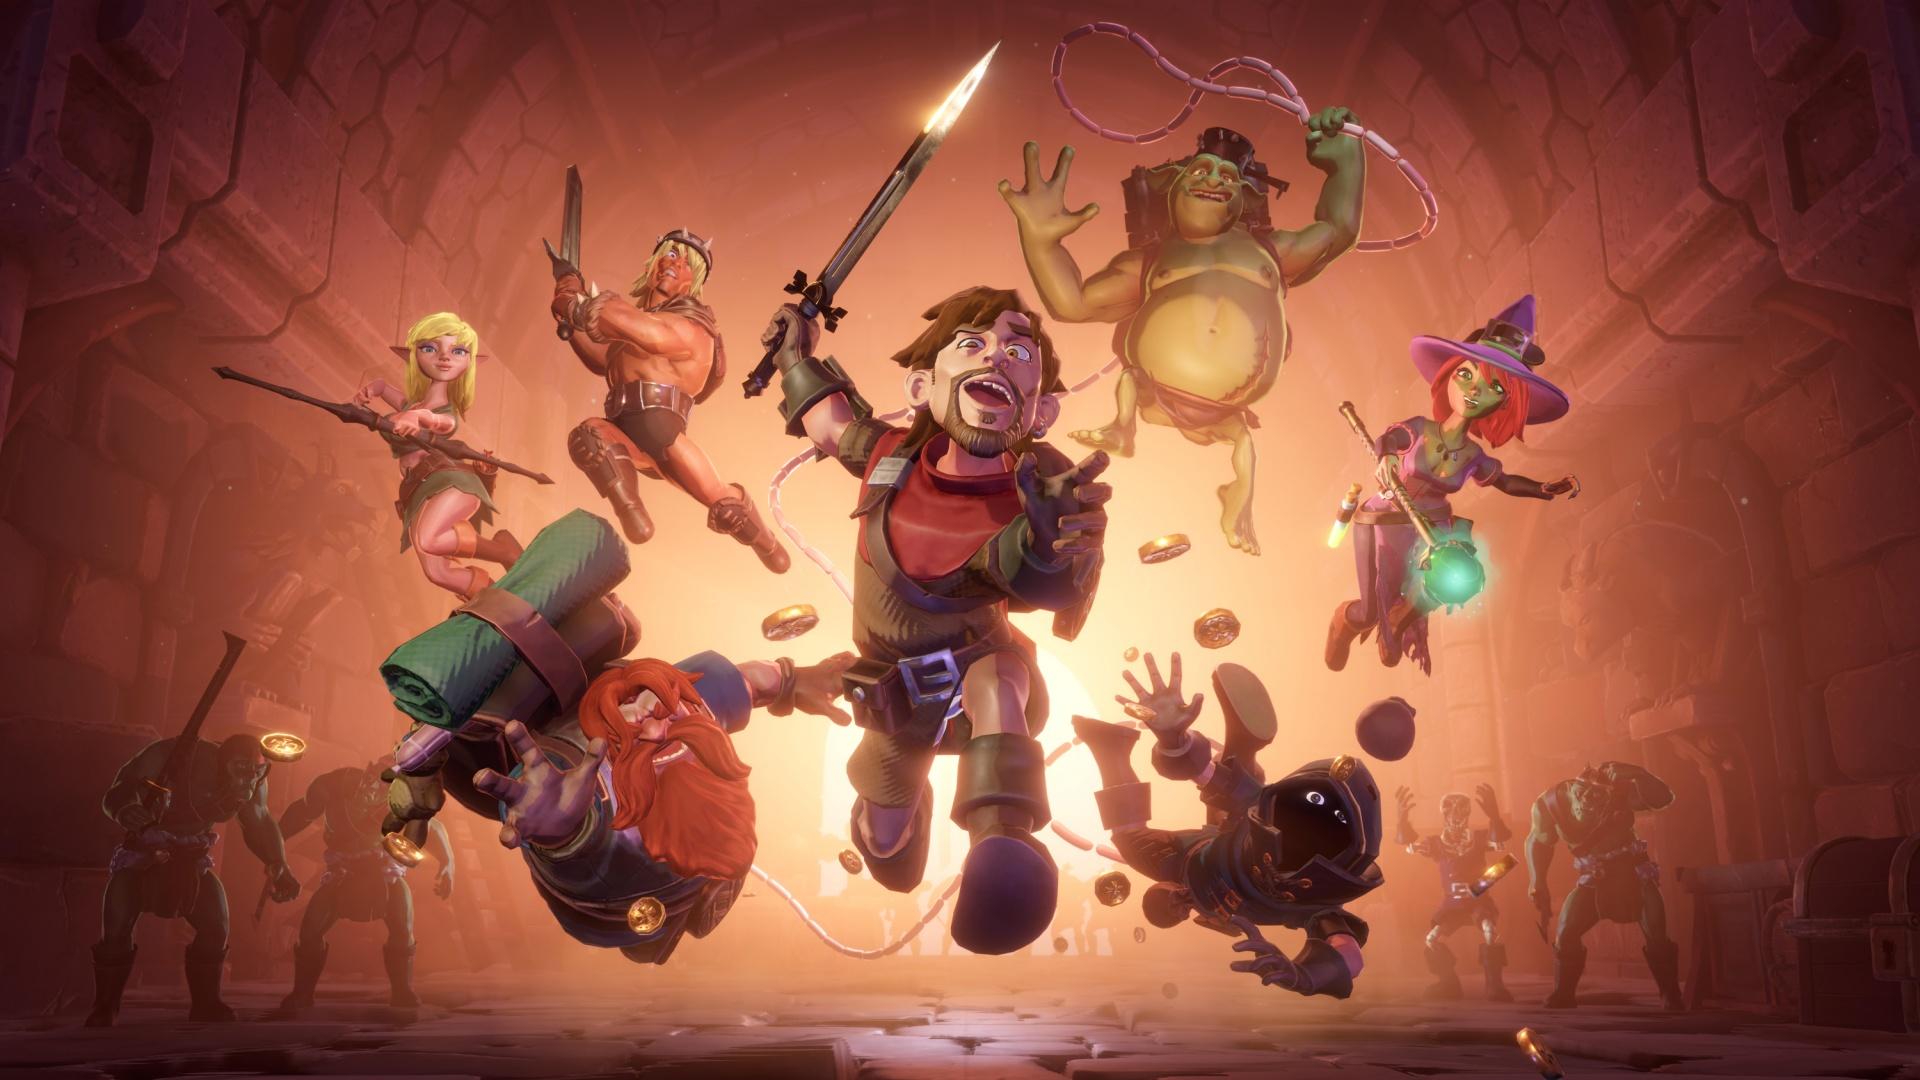 Фелиция Дэй озвучит героиню The Dungeon Of Naheulbeuk: The Amulet Of Chaos